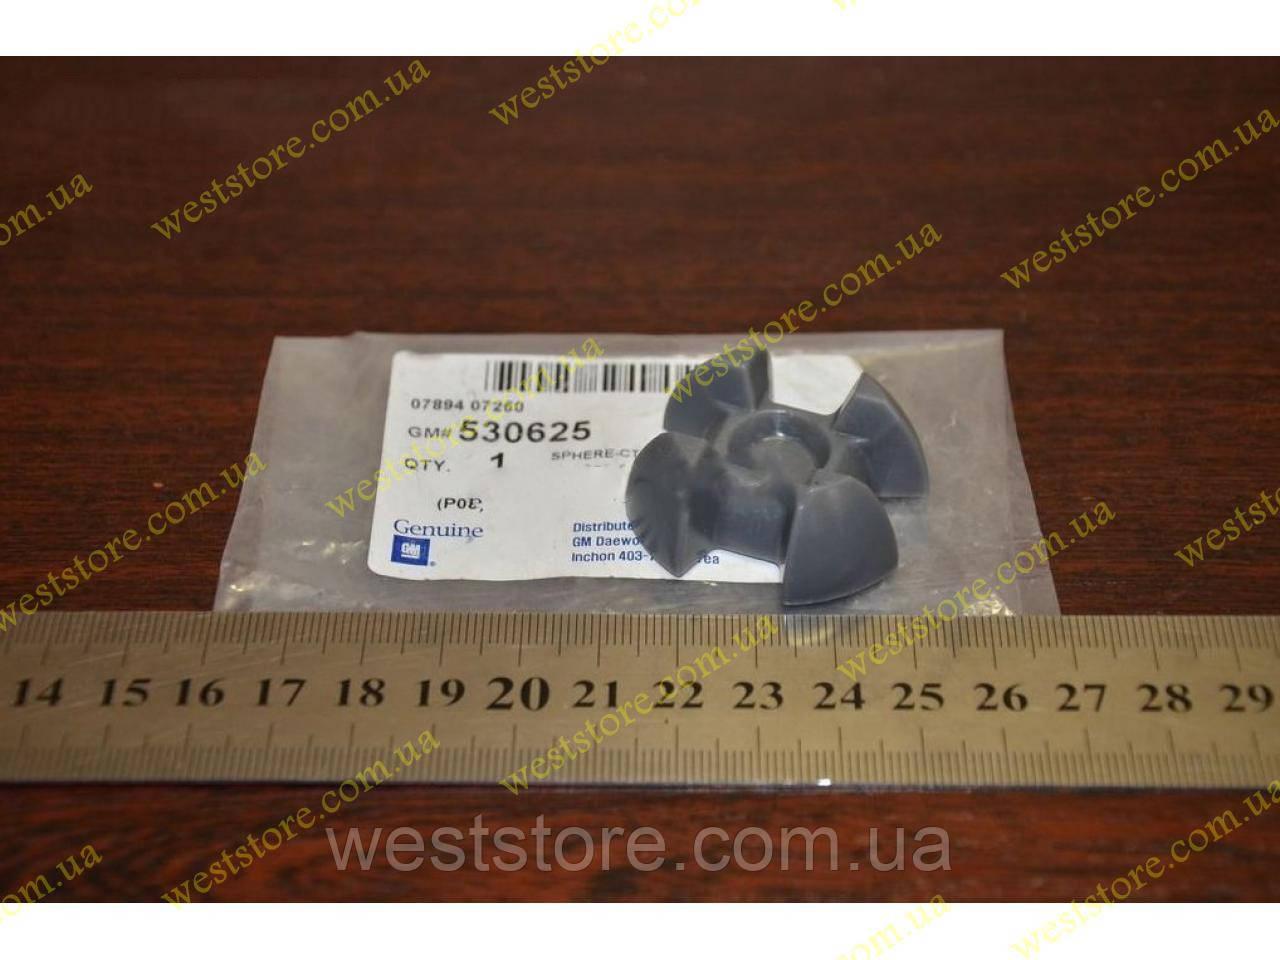 Крестовина рулевой колонки Ланос Lanos GM 530625